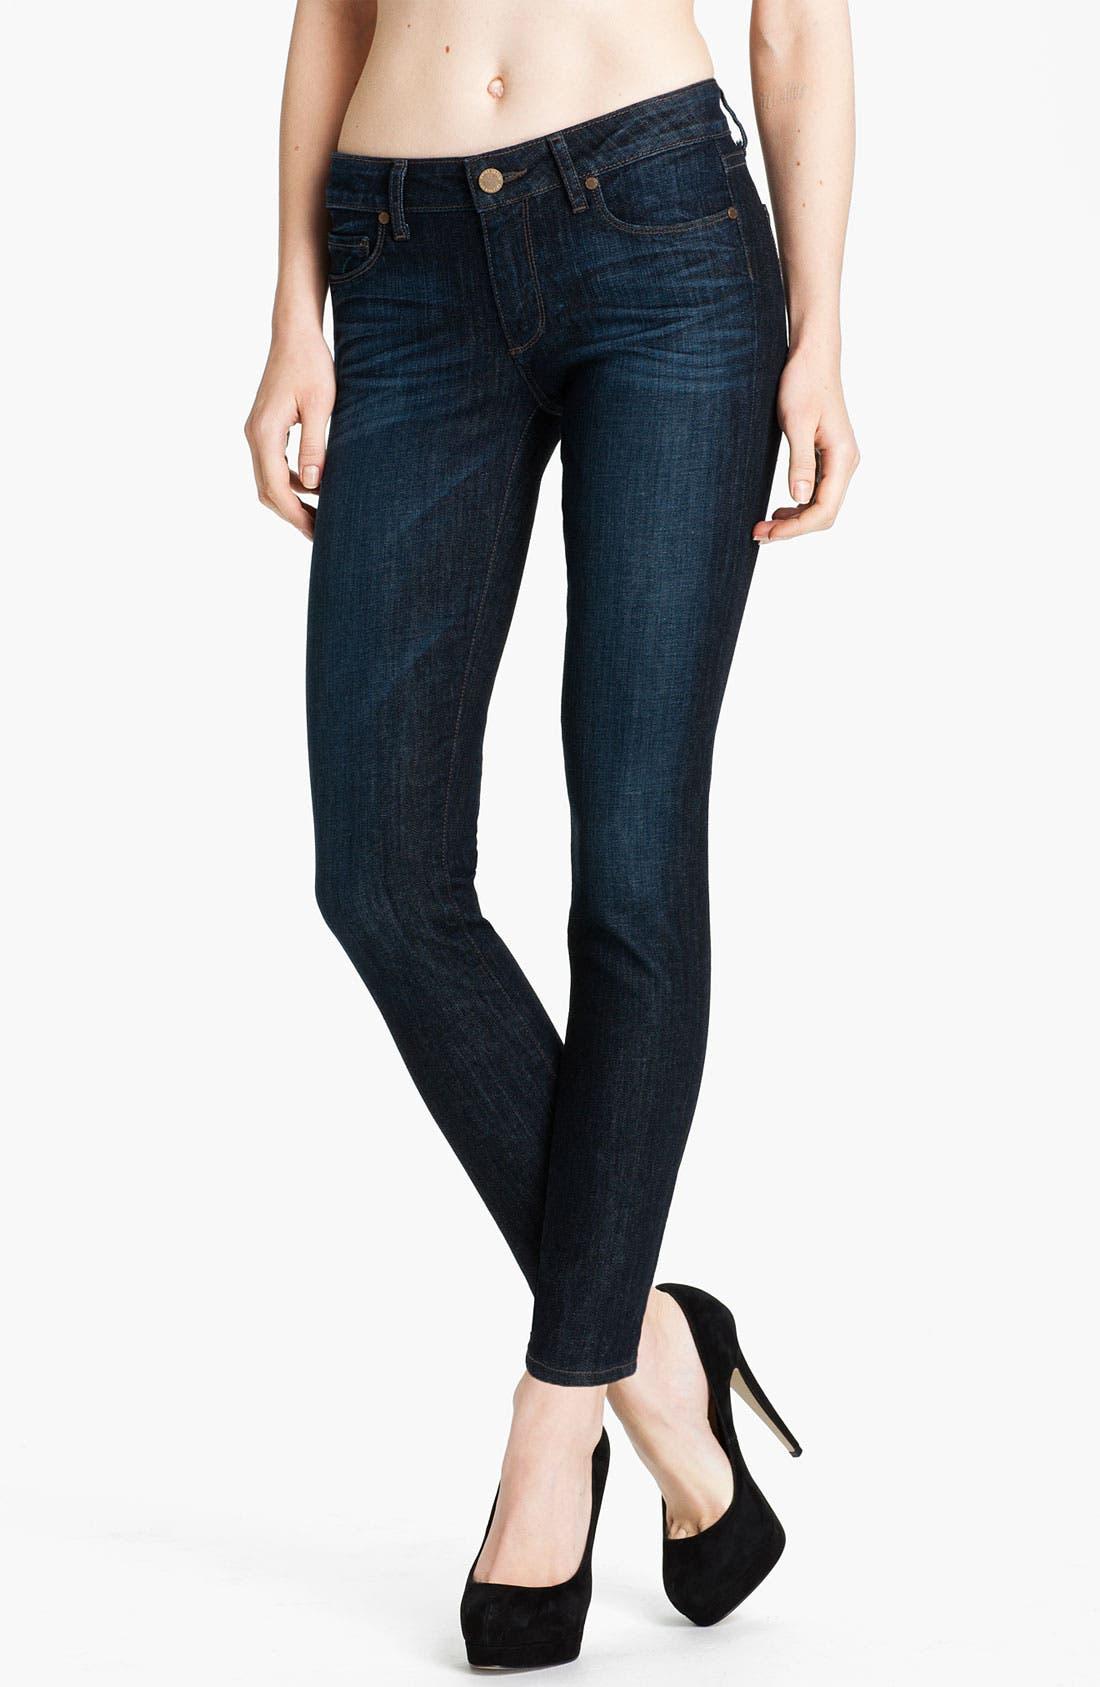 Alternate Image 1 Selected - Paige Denim 'Skyline' Ankle Peg Skinny Stretch Jeans (Hartley)